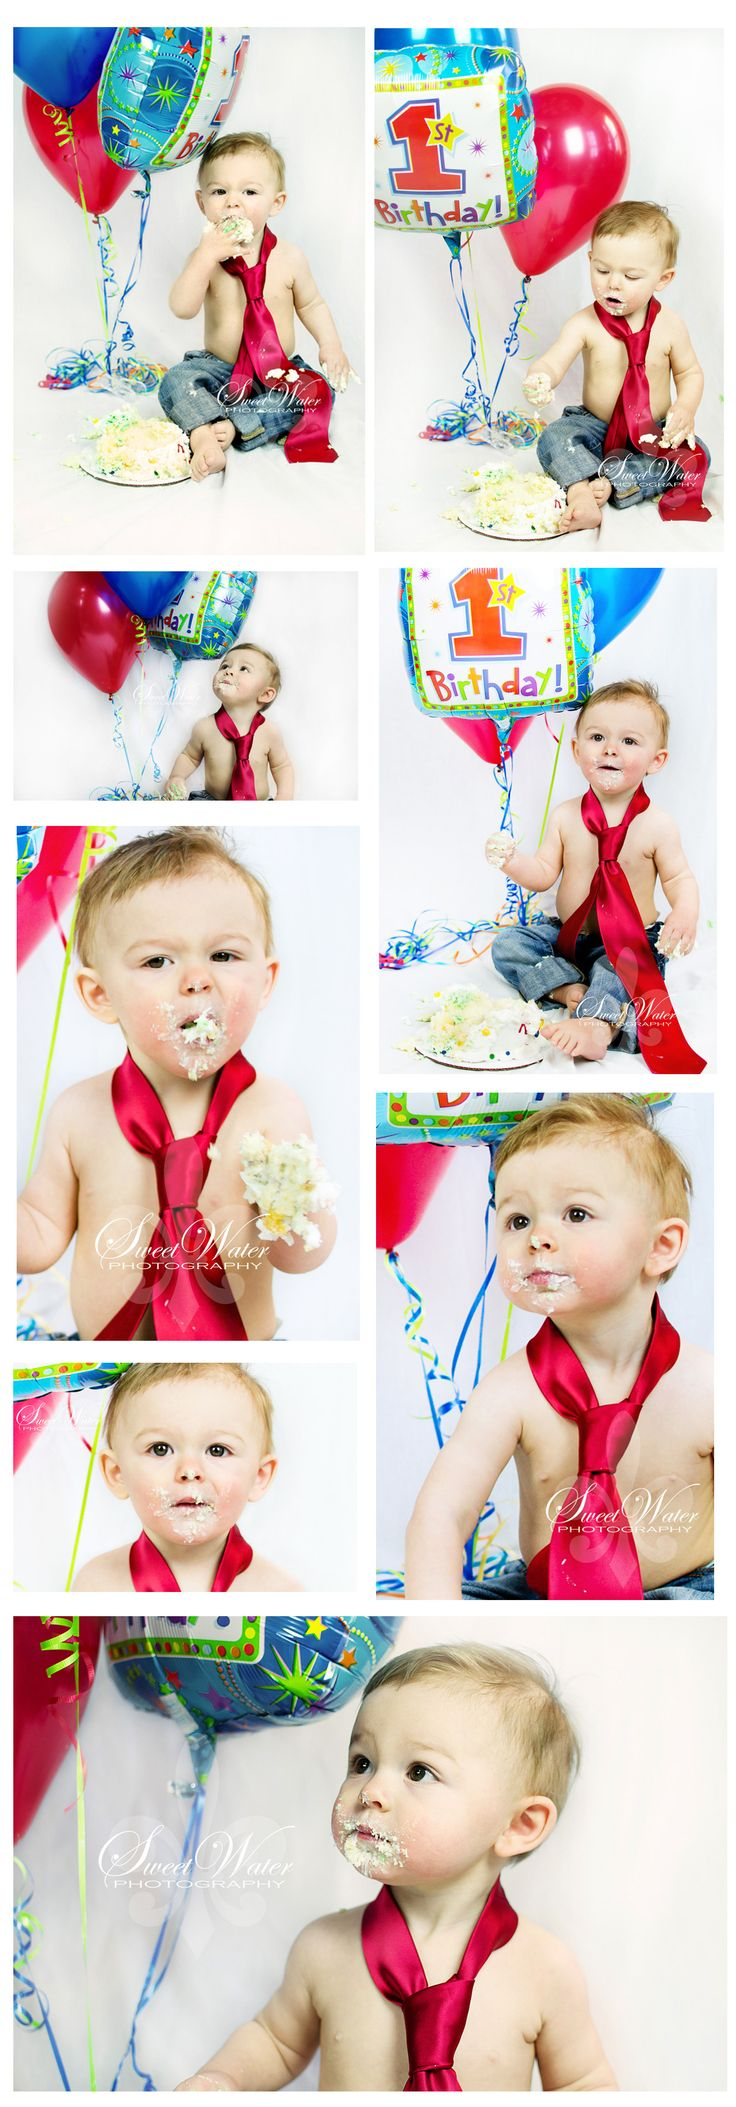 1-year-old-baby-boy-photography, 1st-birthday-photo-shoot, 1st-birthday-photography, cake-smash-photography, kansas-city-1st-birthday-photographer, kansas-city-1st-birthday-photography, kansas-city-baby-boy-photography, kansas-city-baby-photography, kansas-city-cake-smash-photographer, kansas-city-cake-smash-photography, kansas-city-newborn-photographer, kansas-city-portrait-photographer, kansas-city-portrait-photography, www.sweetwaterphotographykc.com